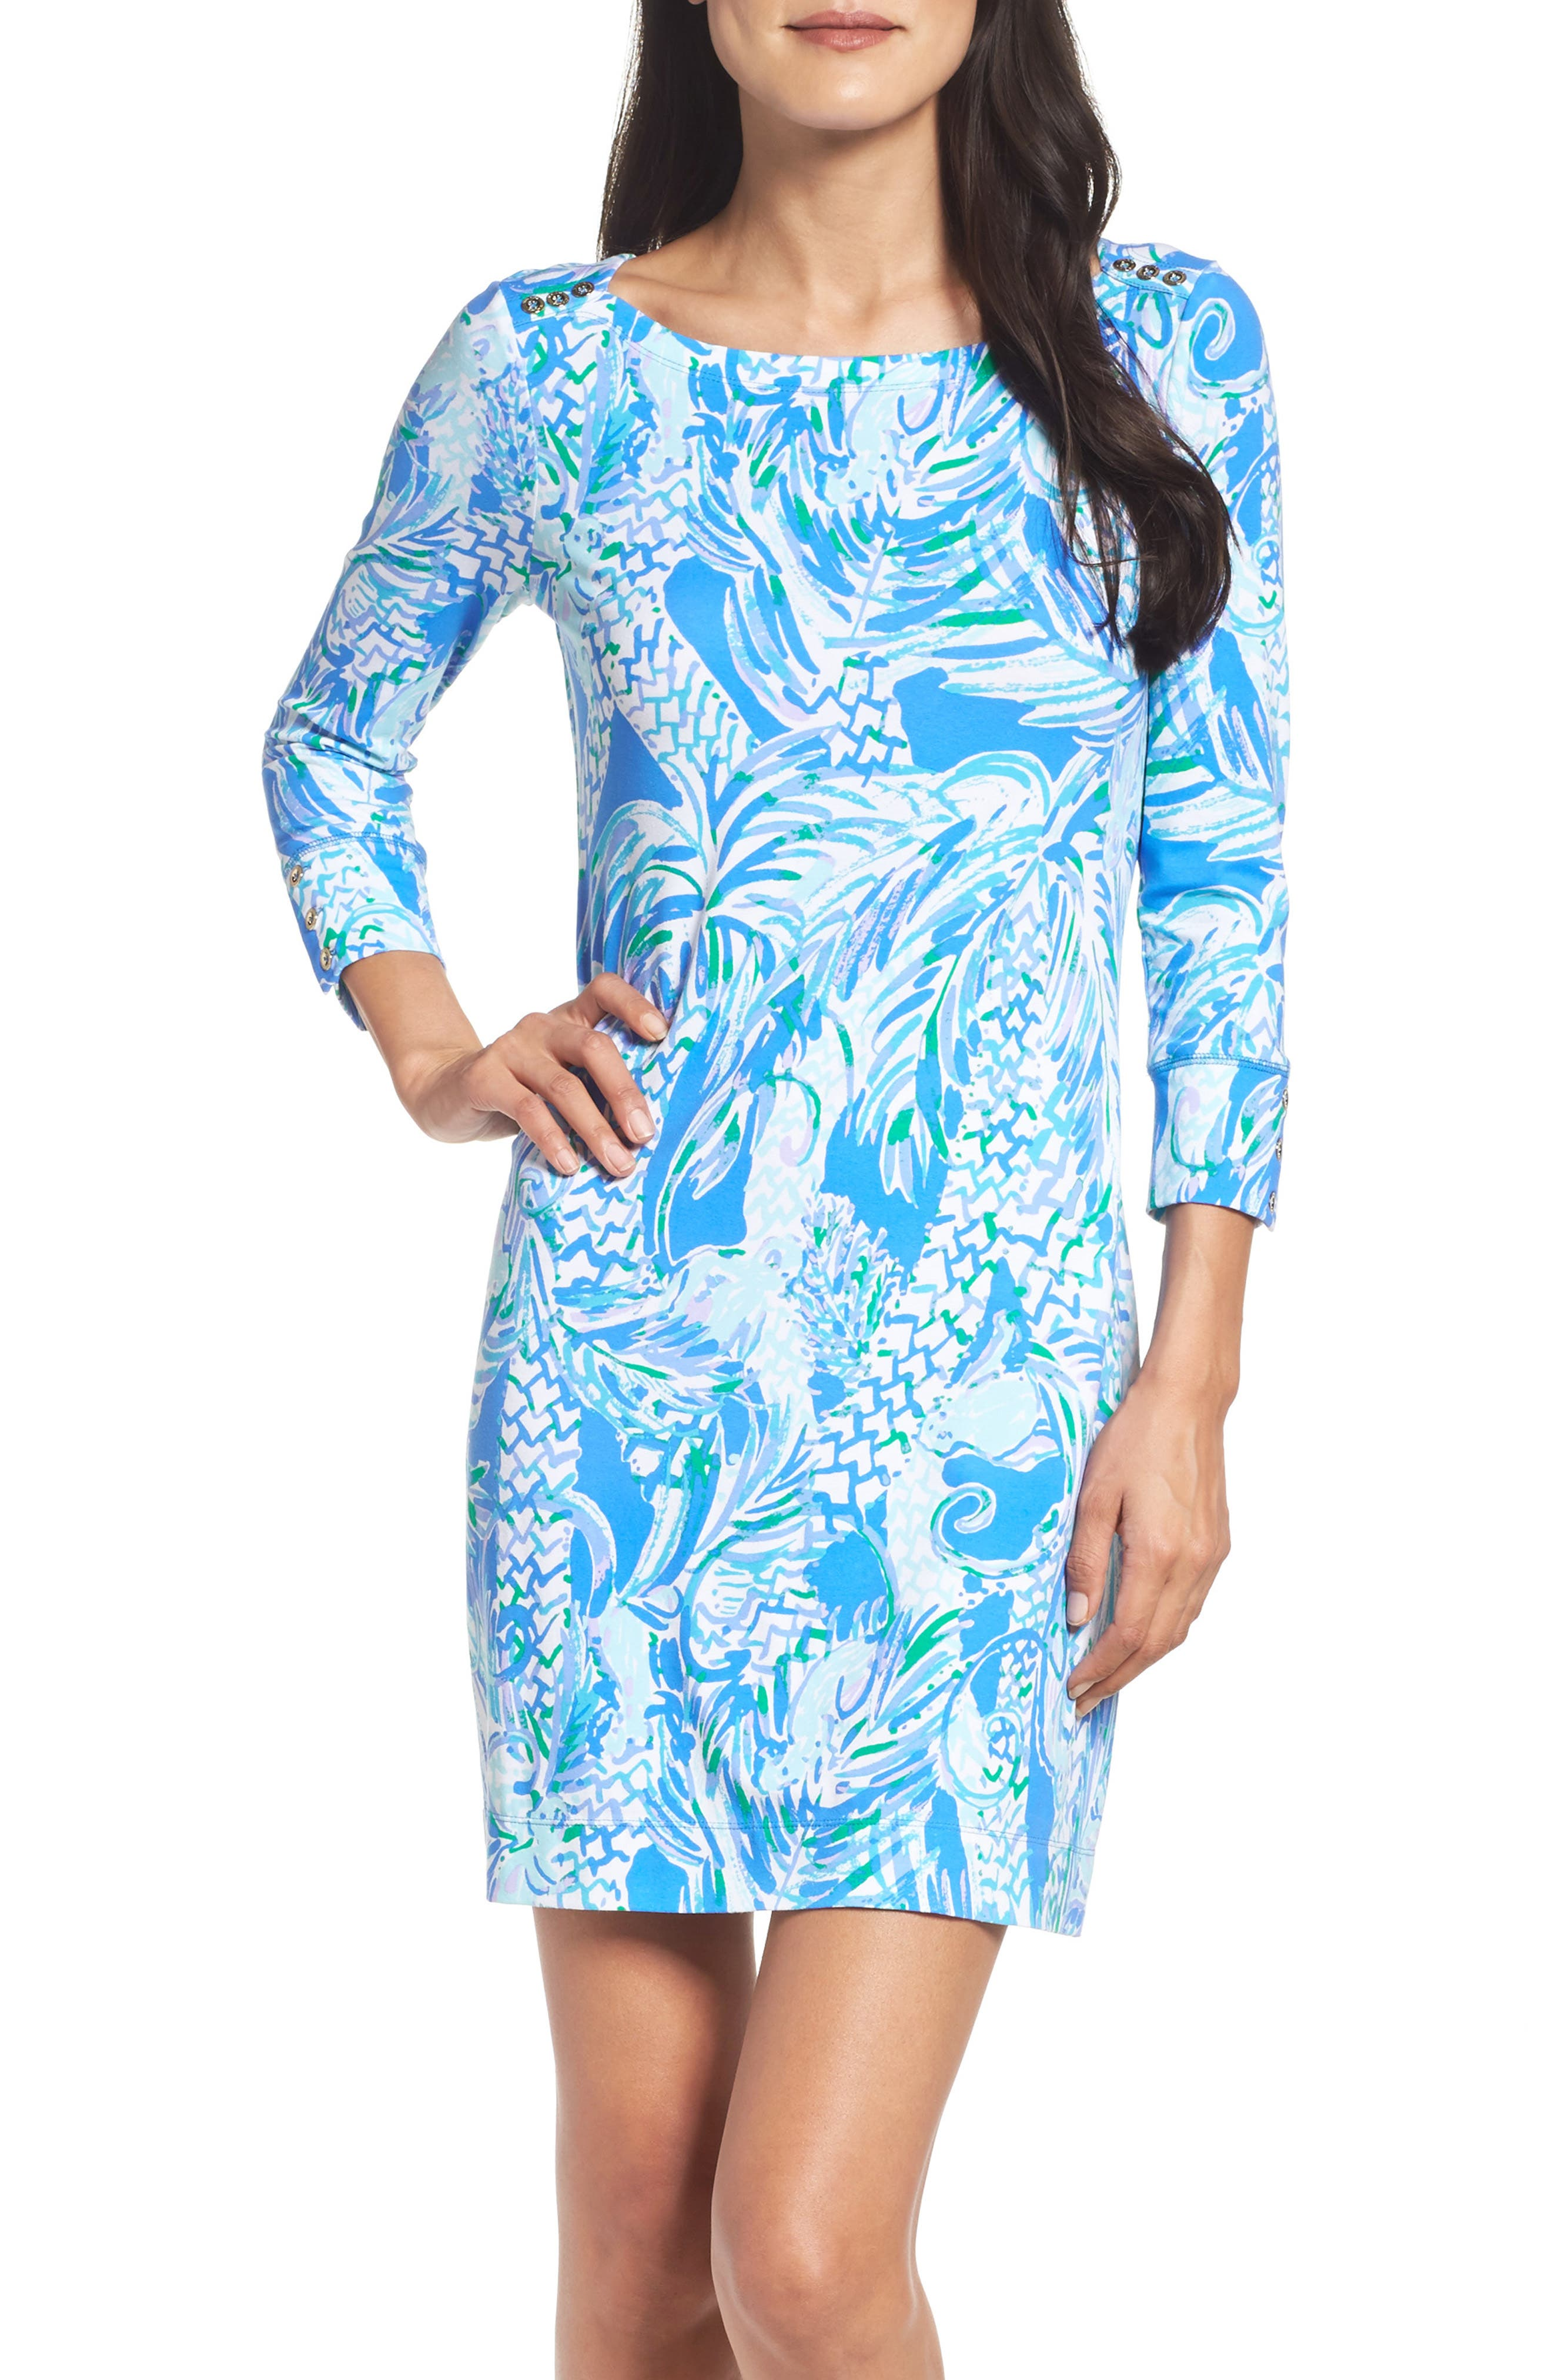 Main Image - Lilly Pulitzer® Sophie UPF 50+ Dress